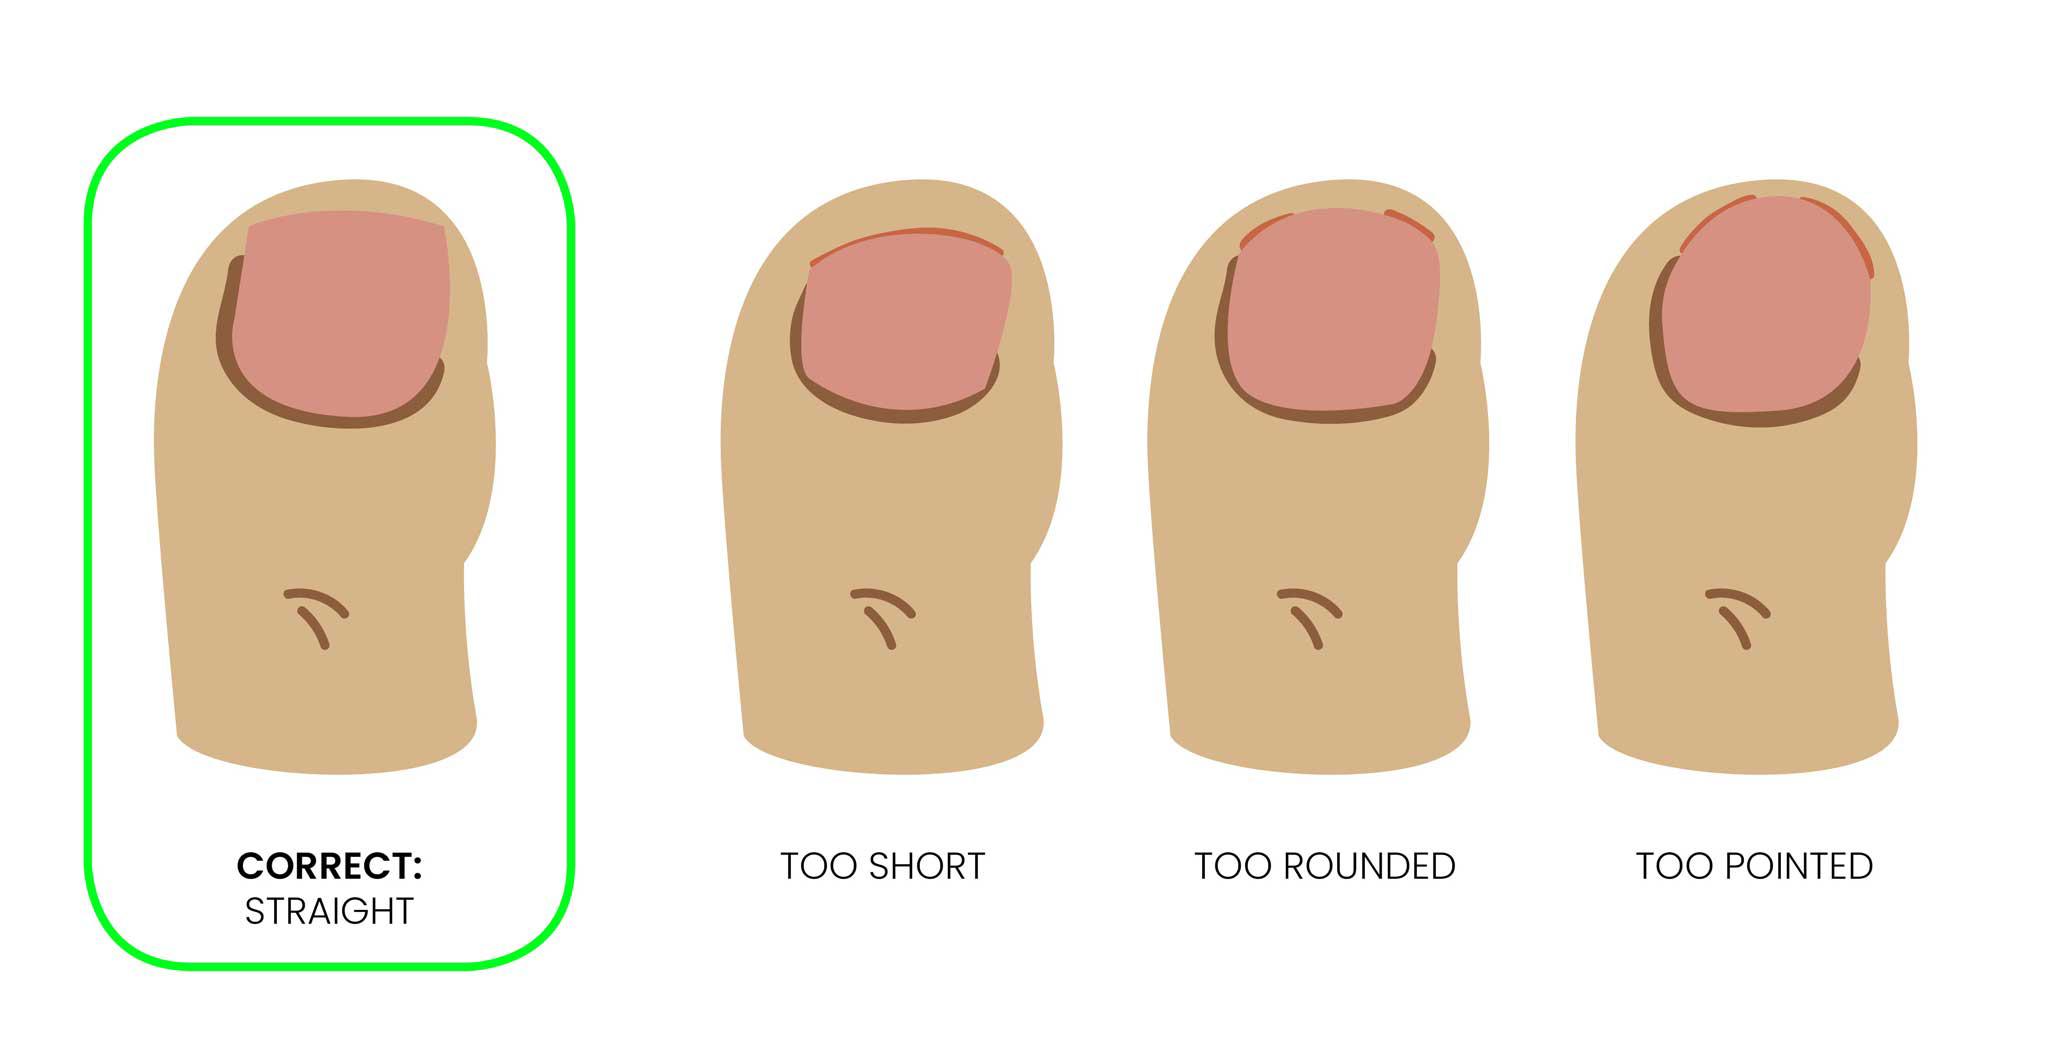 Trim toenails regularly - straight across